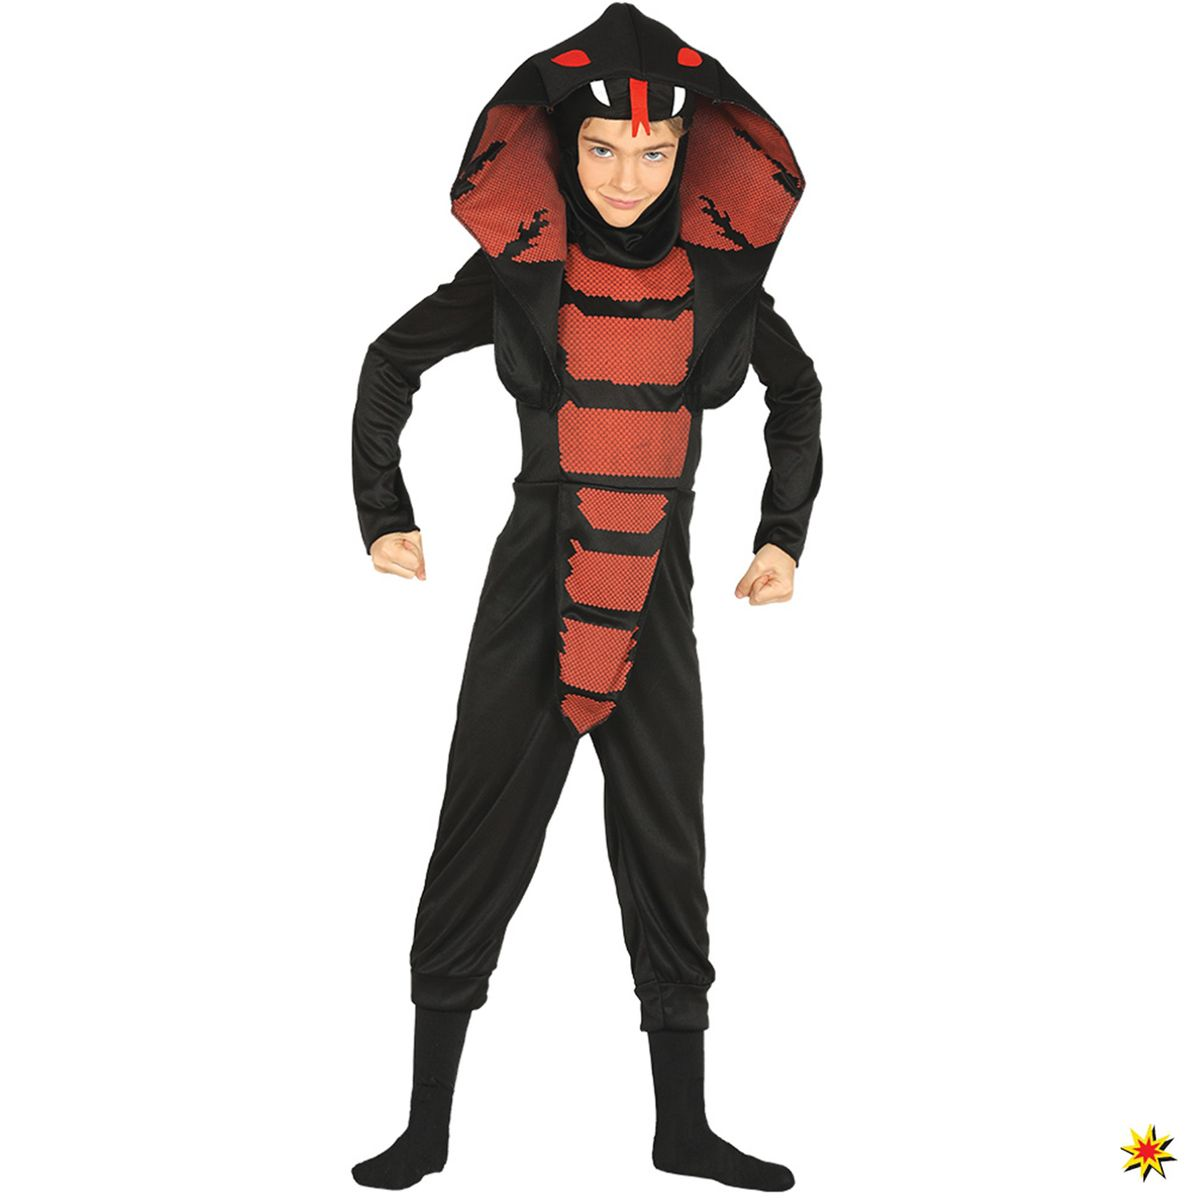 Kinder Kostum Schlange Kobra Ninja Grosse L 7 9 Jahre